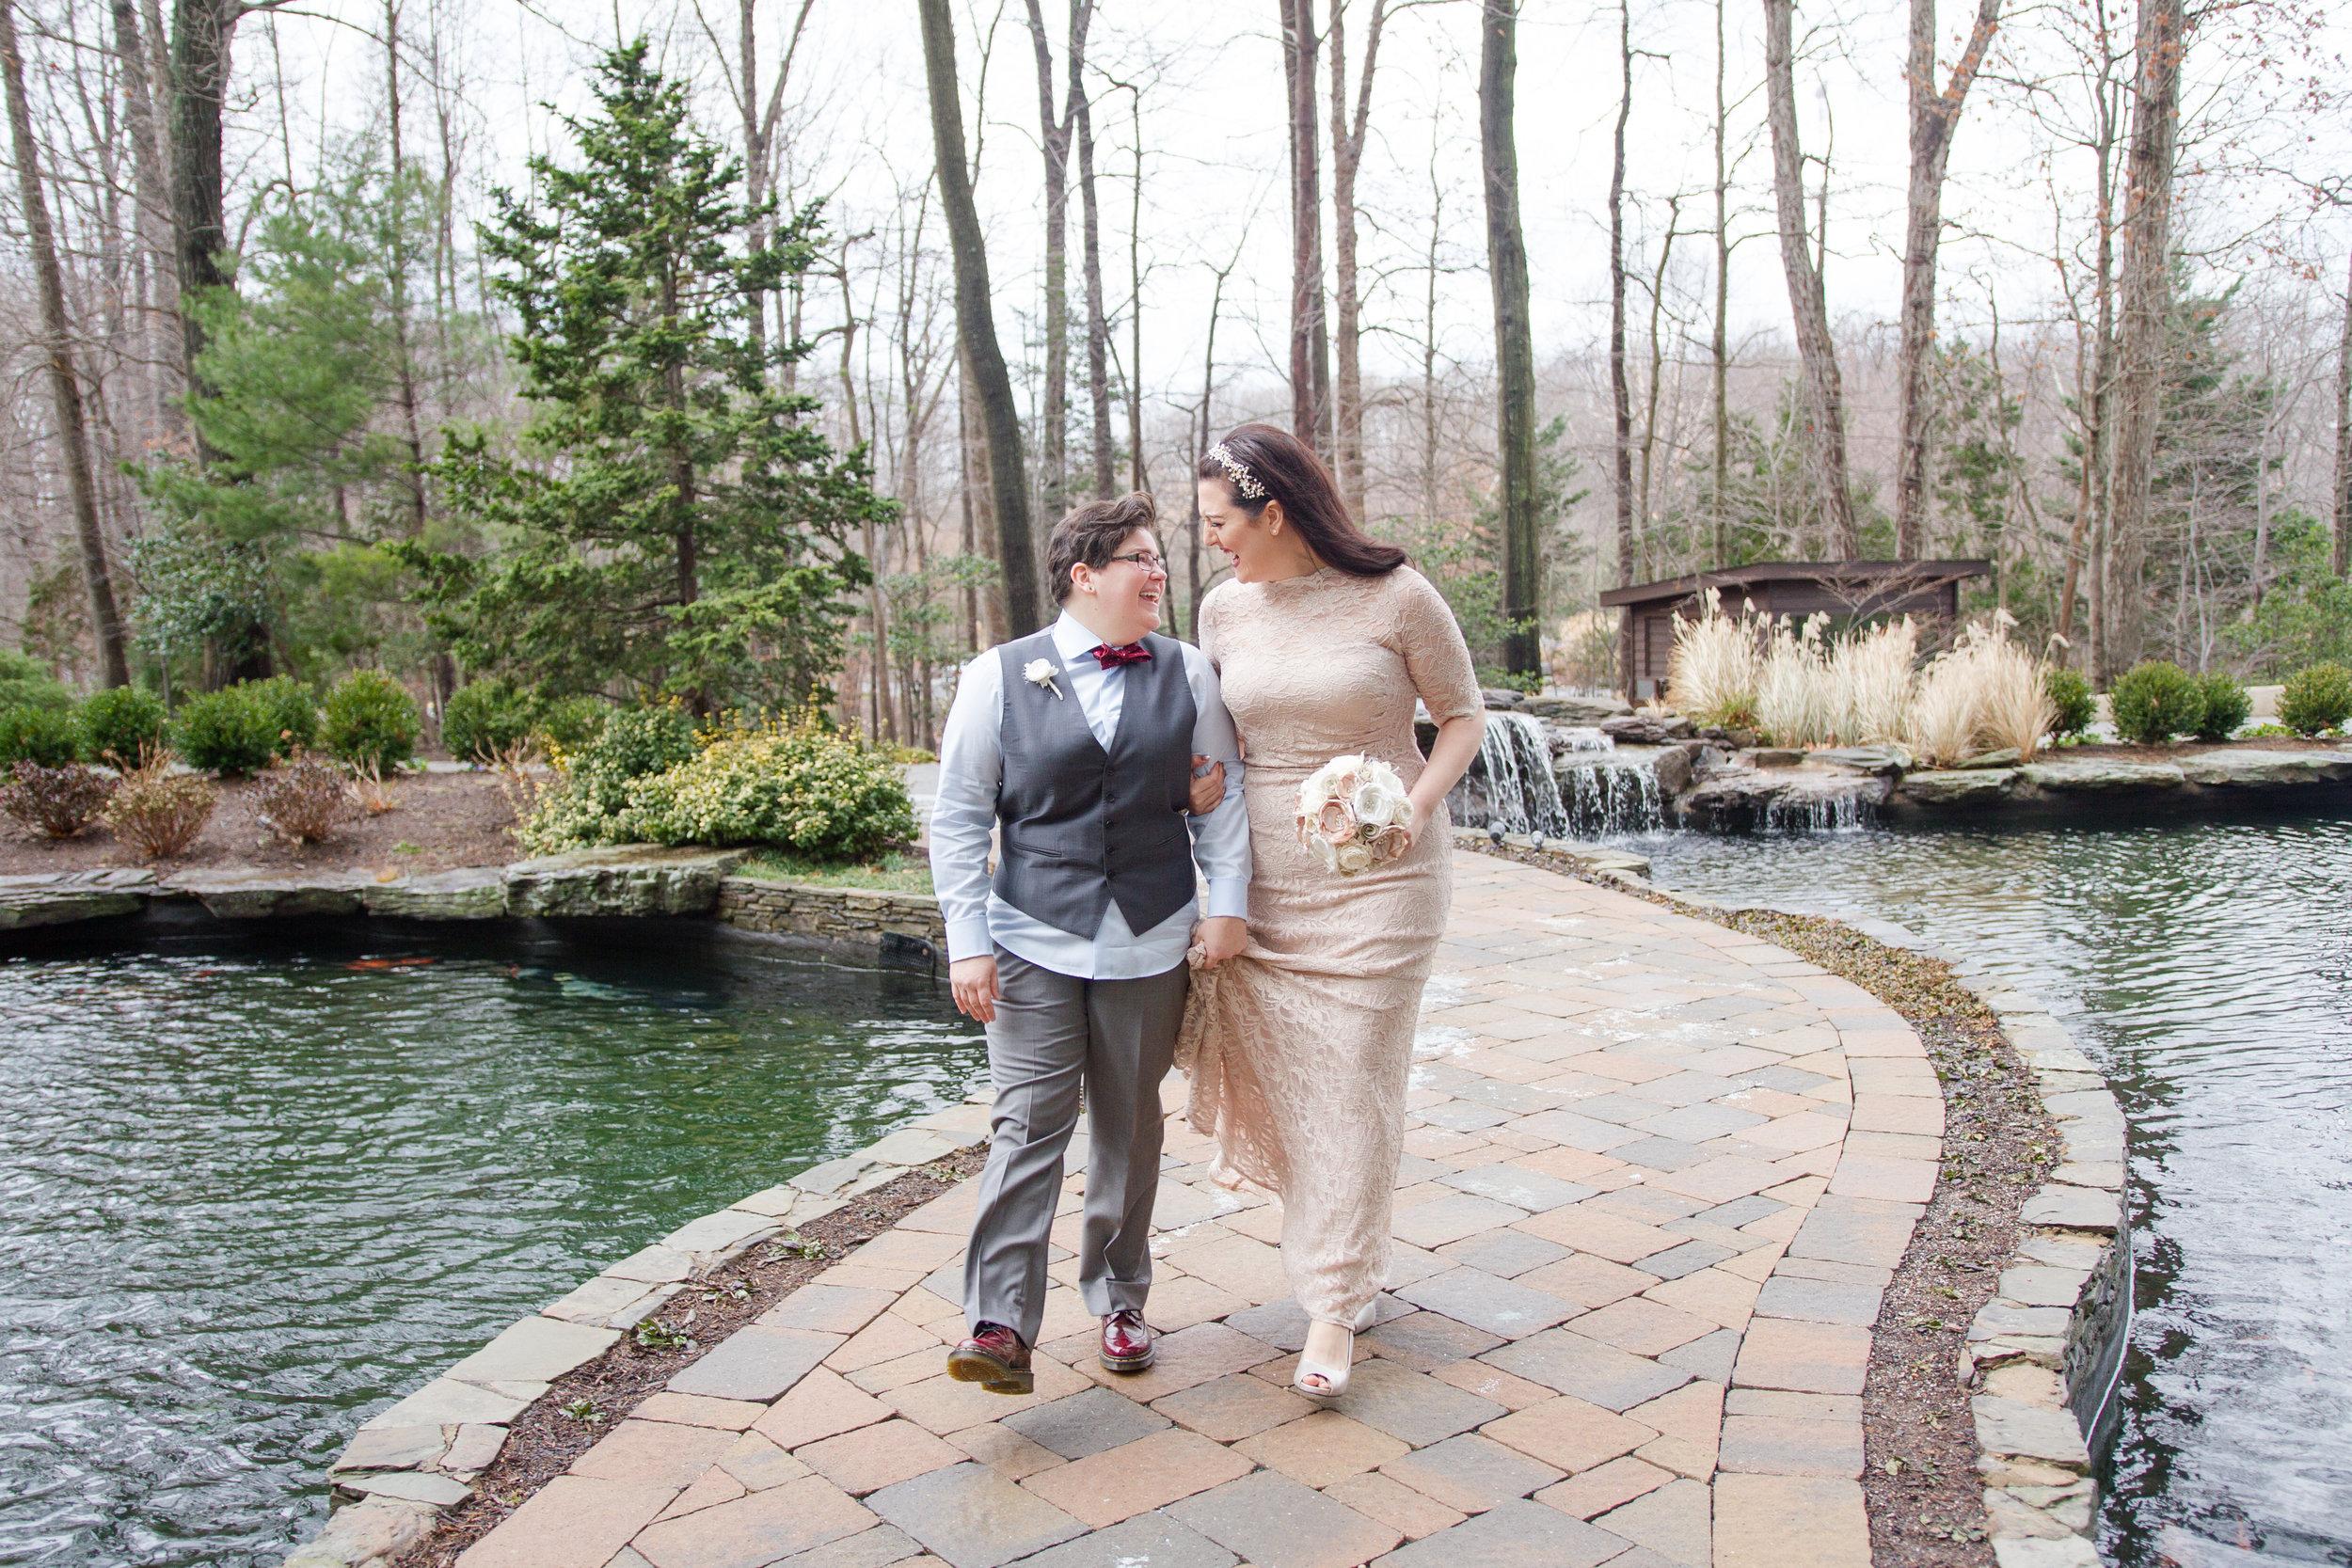 Jenn and Bek | 2941 Restaurant Wedding Photographer | Falls Church, Virginia Wedding Photographer | Maral Noori Photography | Virginia Same Sex Photographer | Virginia LGBTQ Wedding